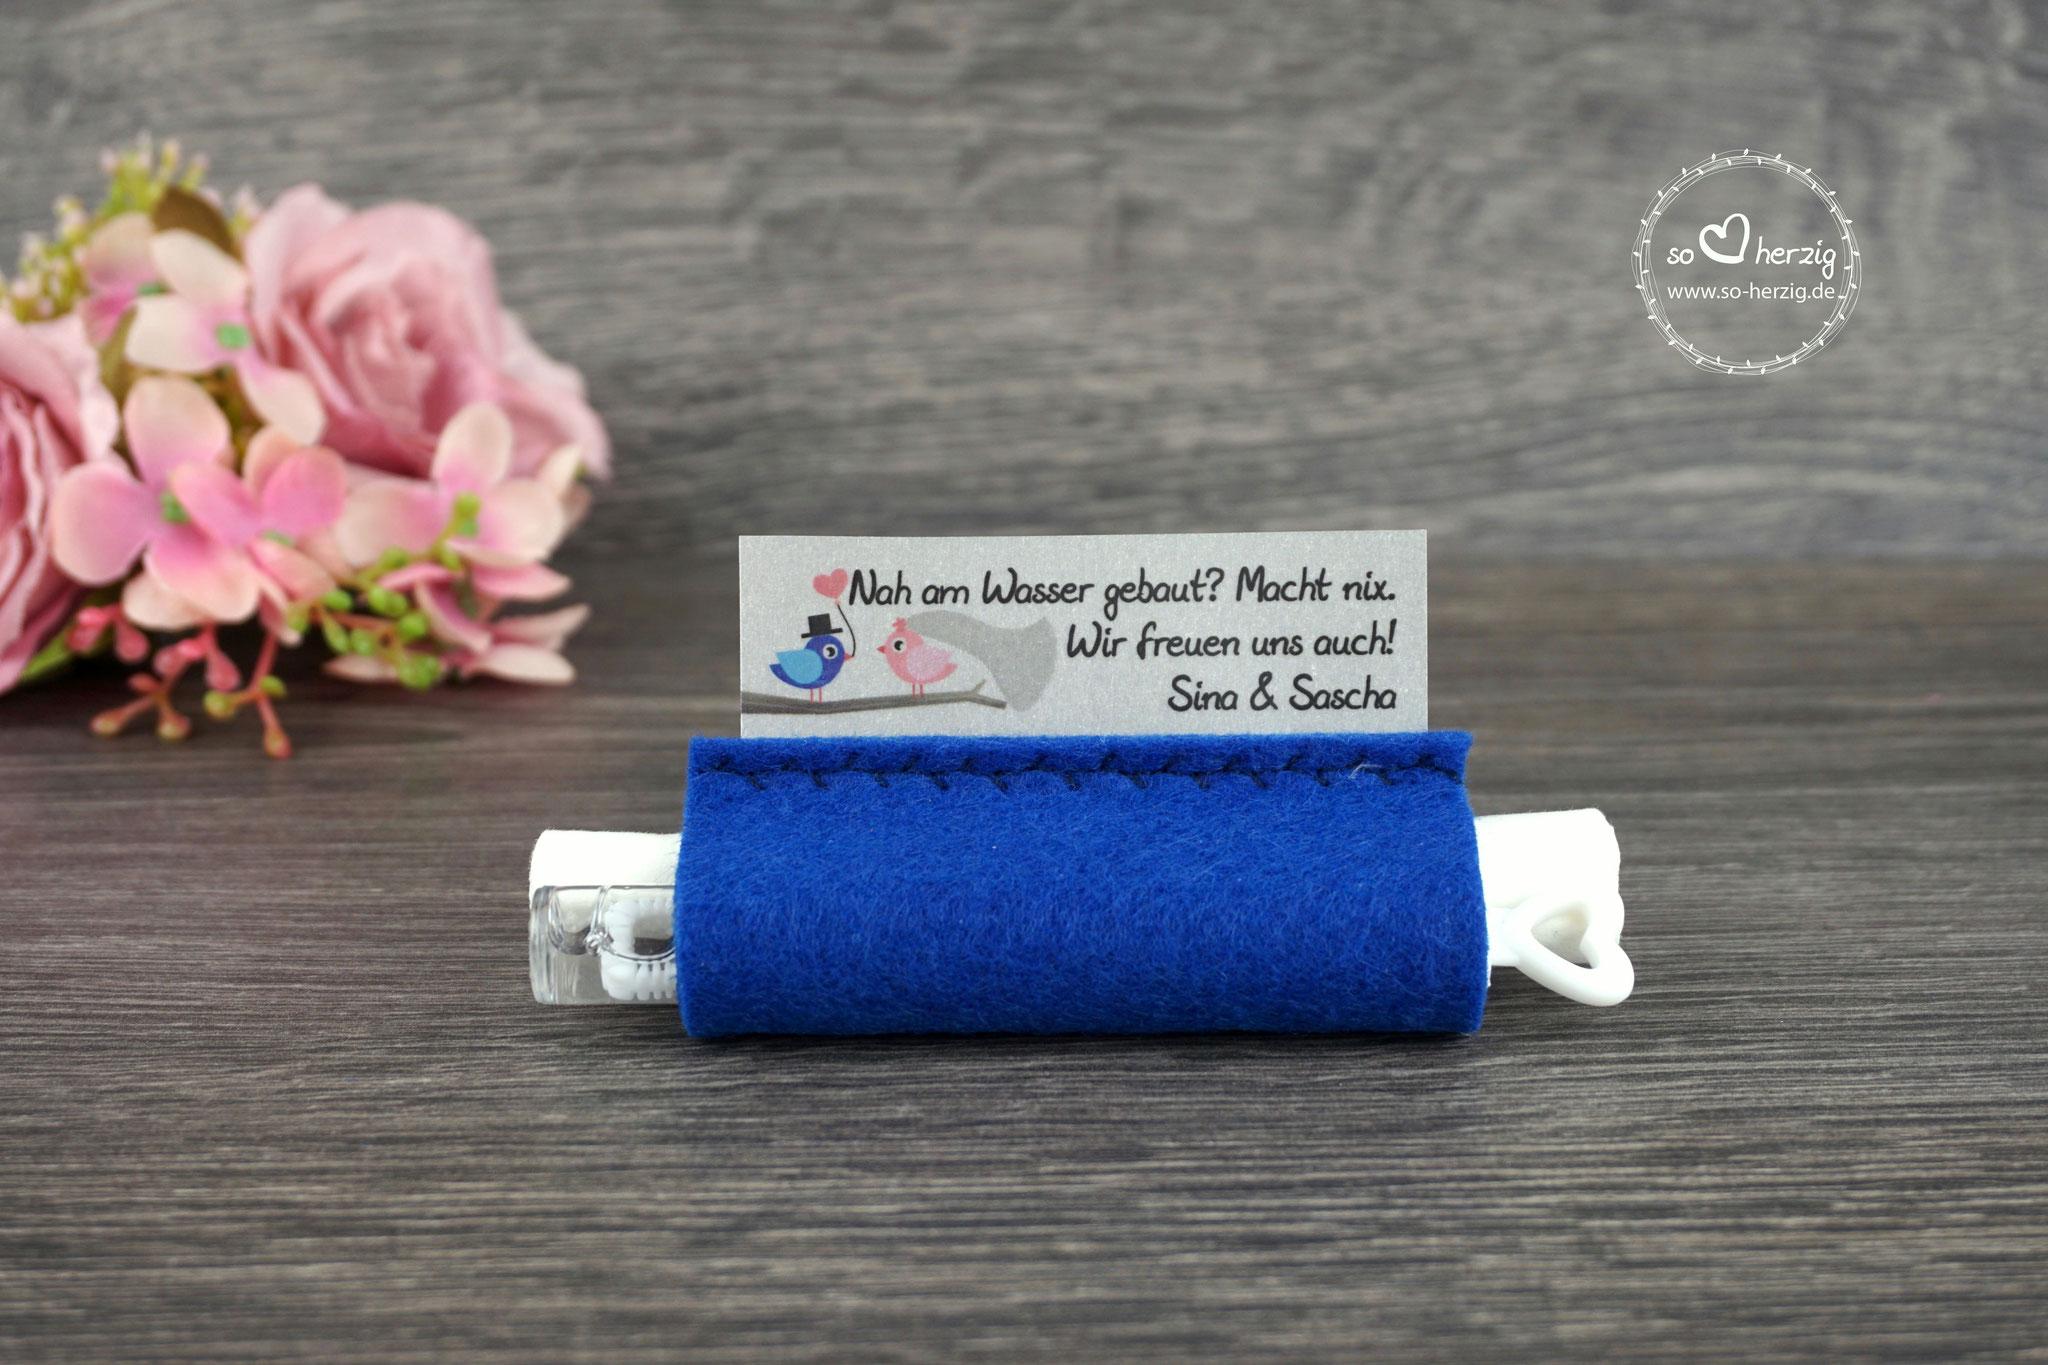 Freudentränen Taschentücher mit Bubbles, Filz royalblau, Design Hochzeitsvögel royalblau/rosa